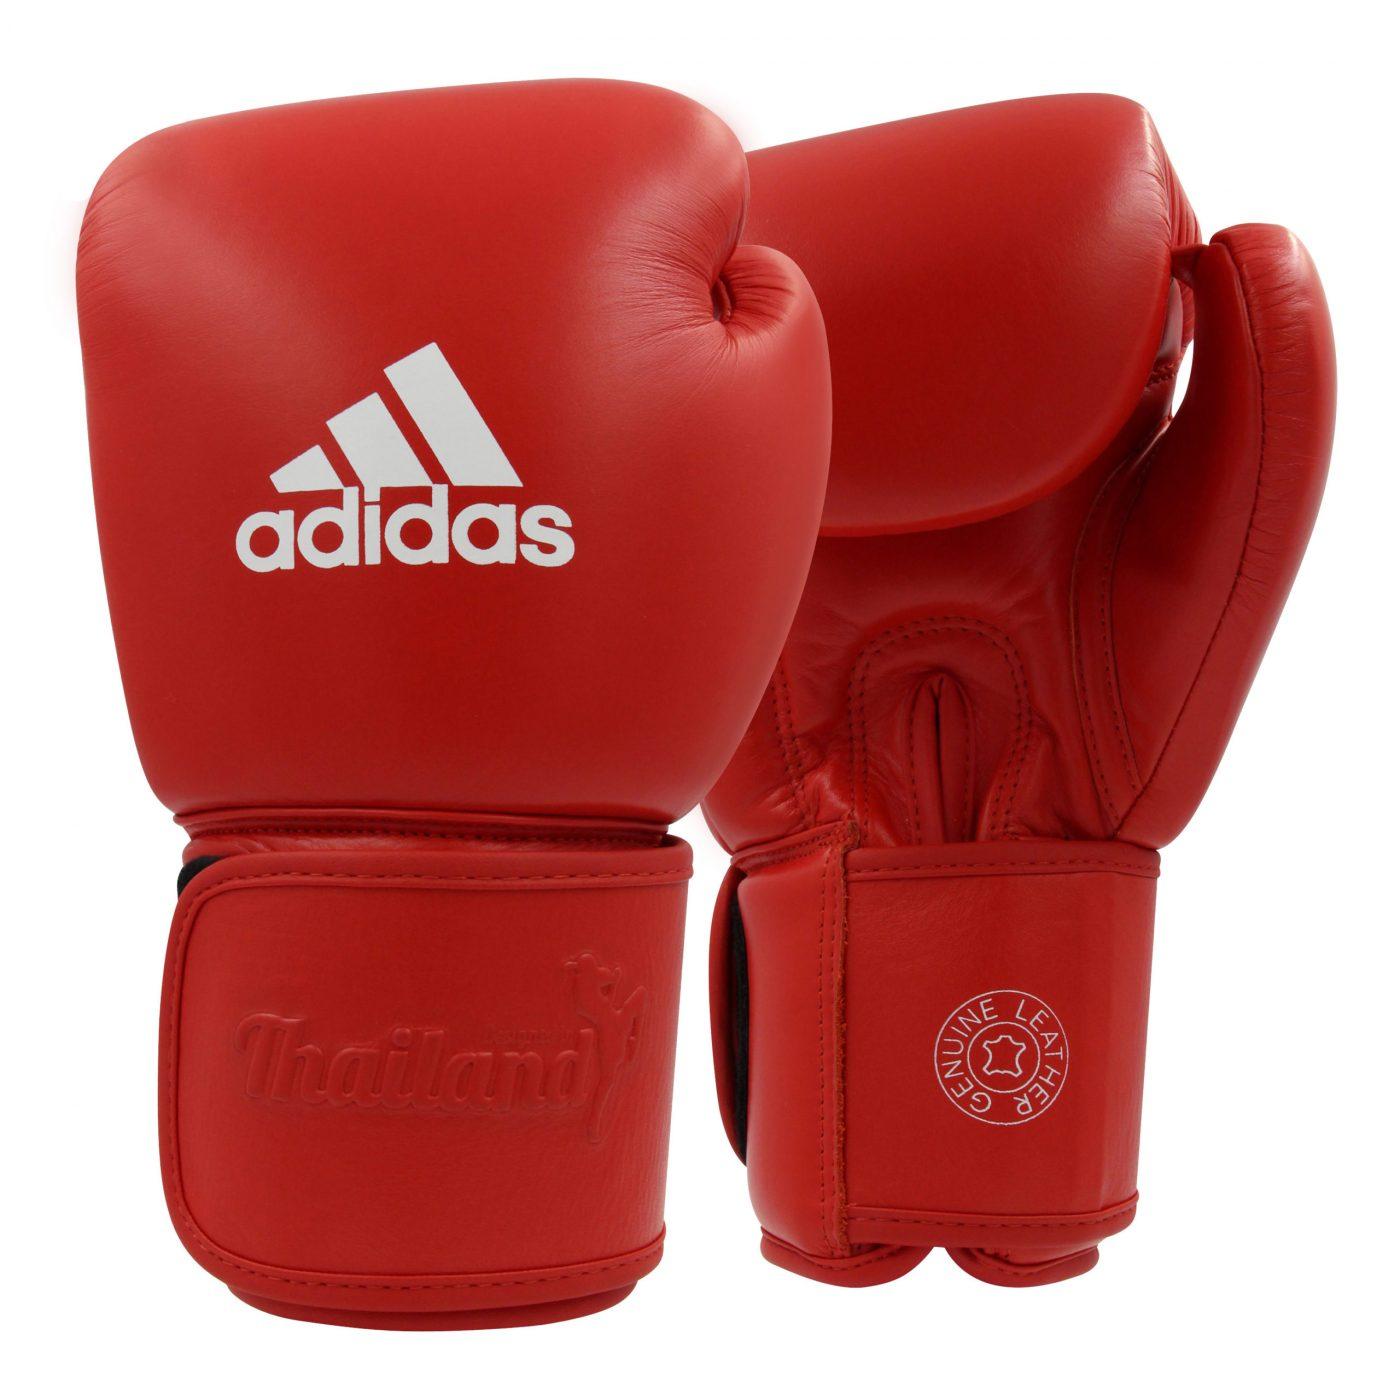 adidas Muay Thai Handschoenen TP200 Rood/Wit 10oz